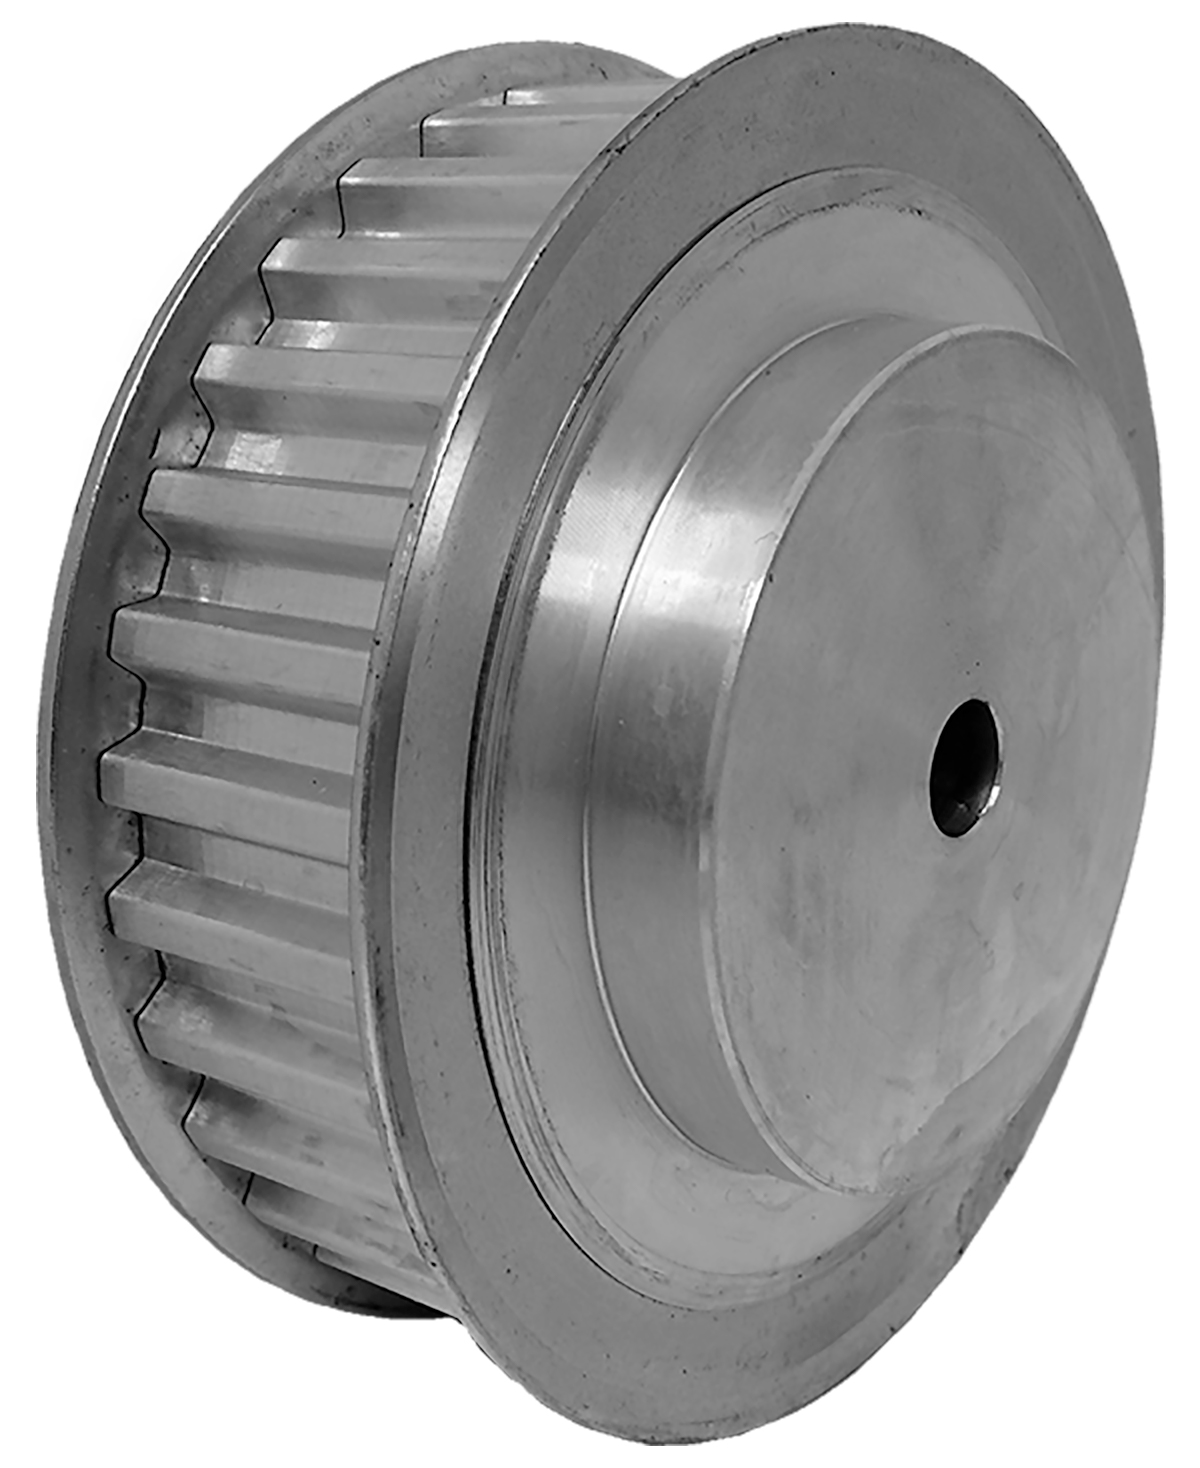 40T10/32-2 - Aluminum Metric Pulleys